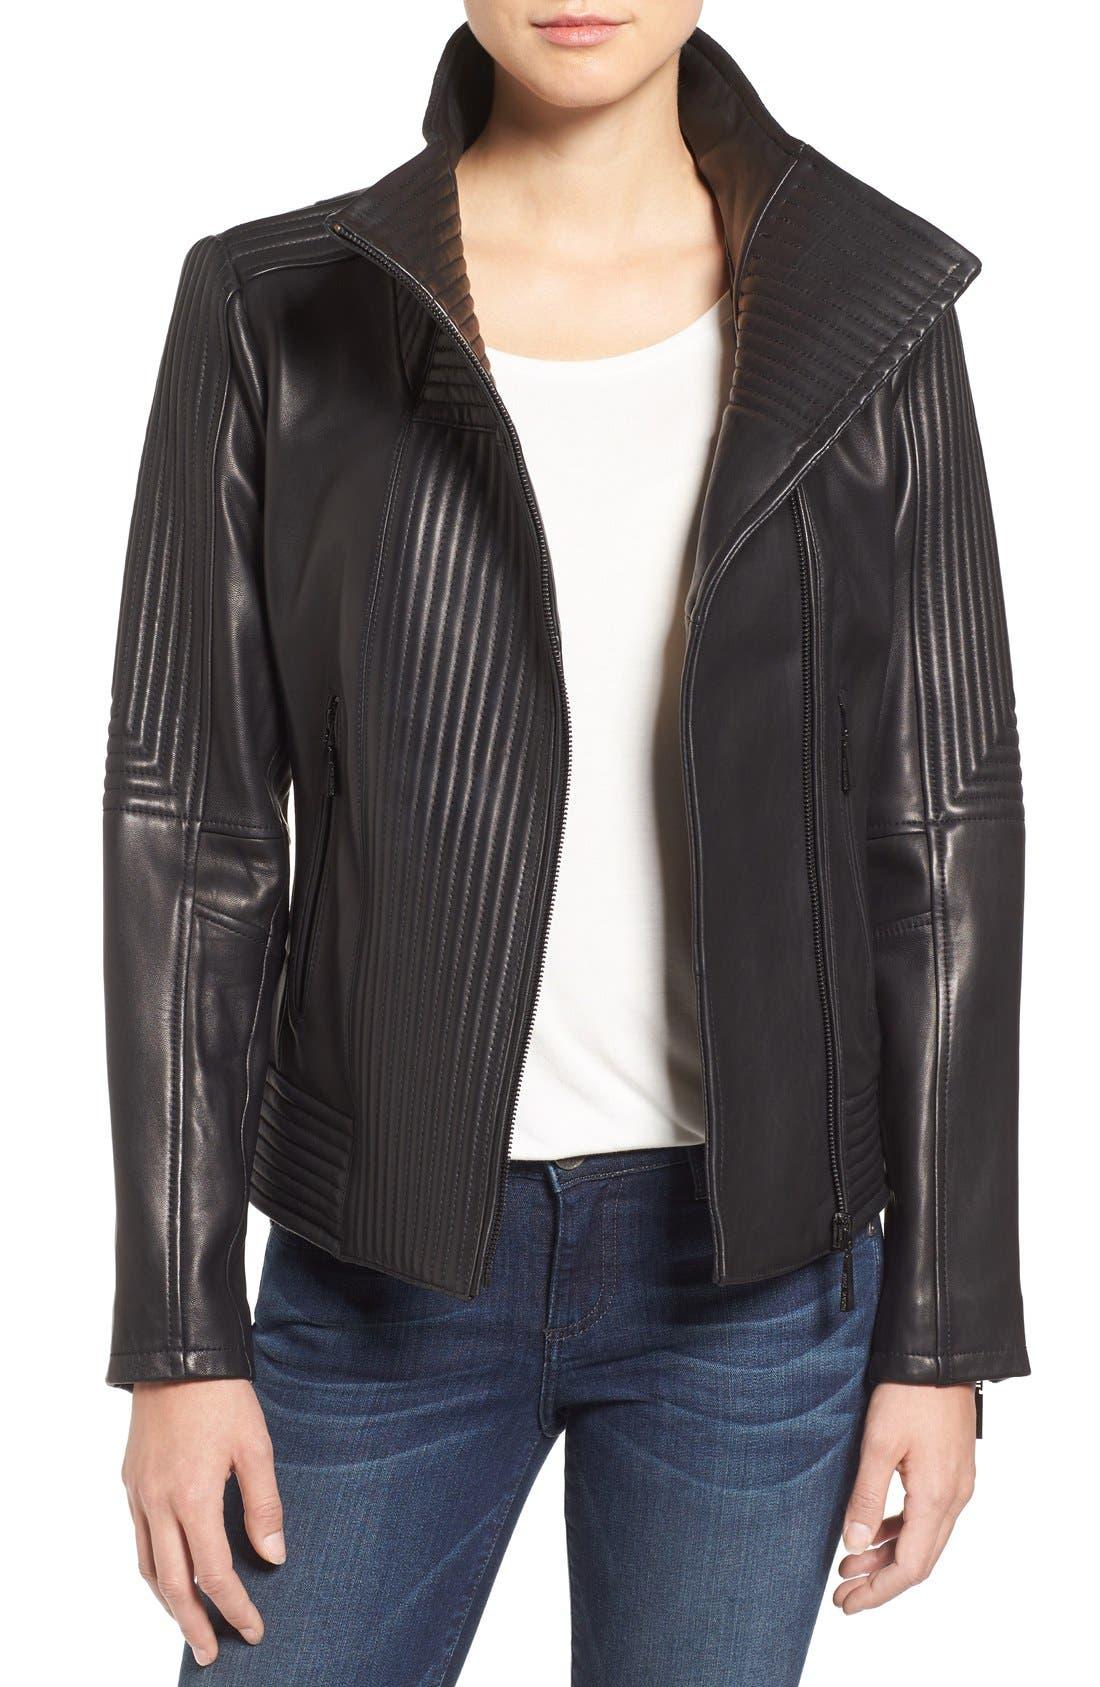 Main Image - Vince Camuto Trapunto Leather Jacket